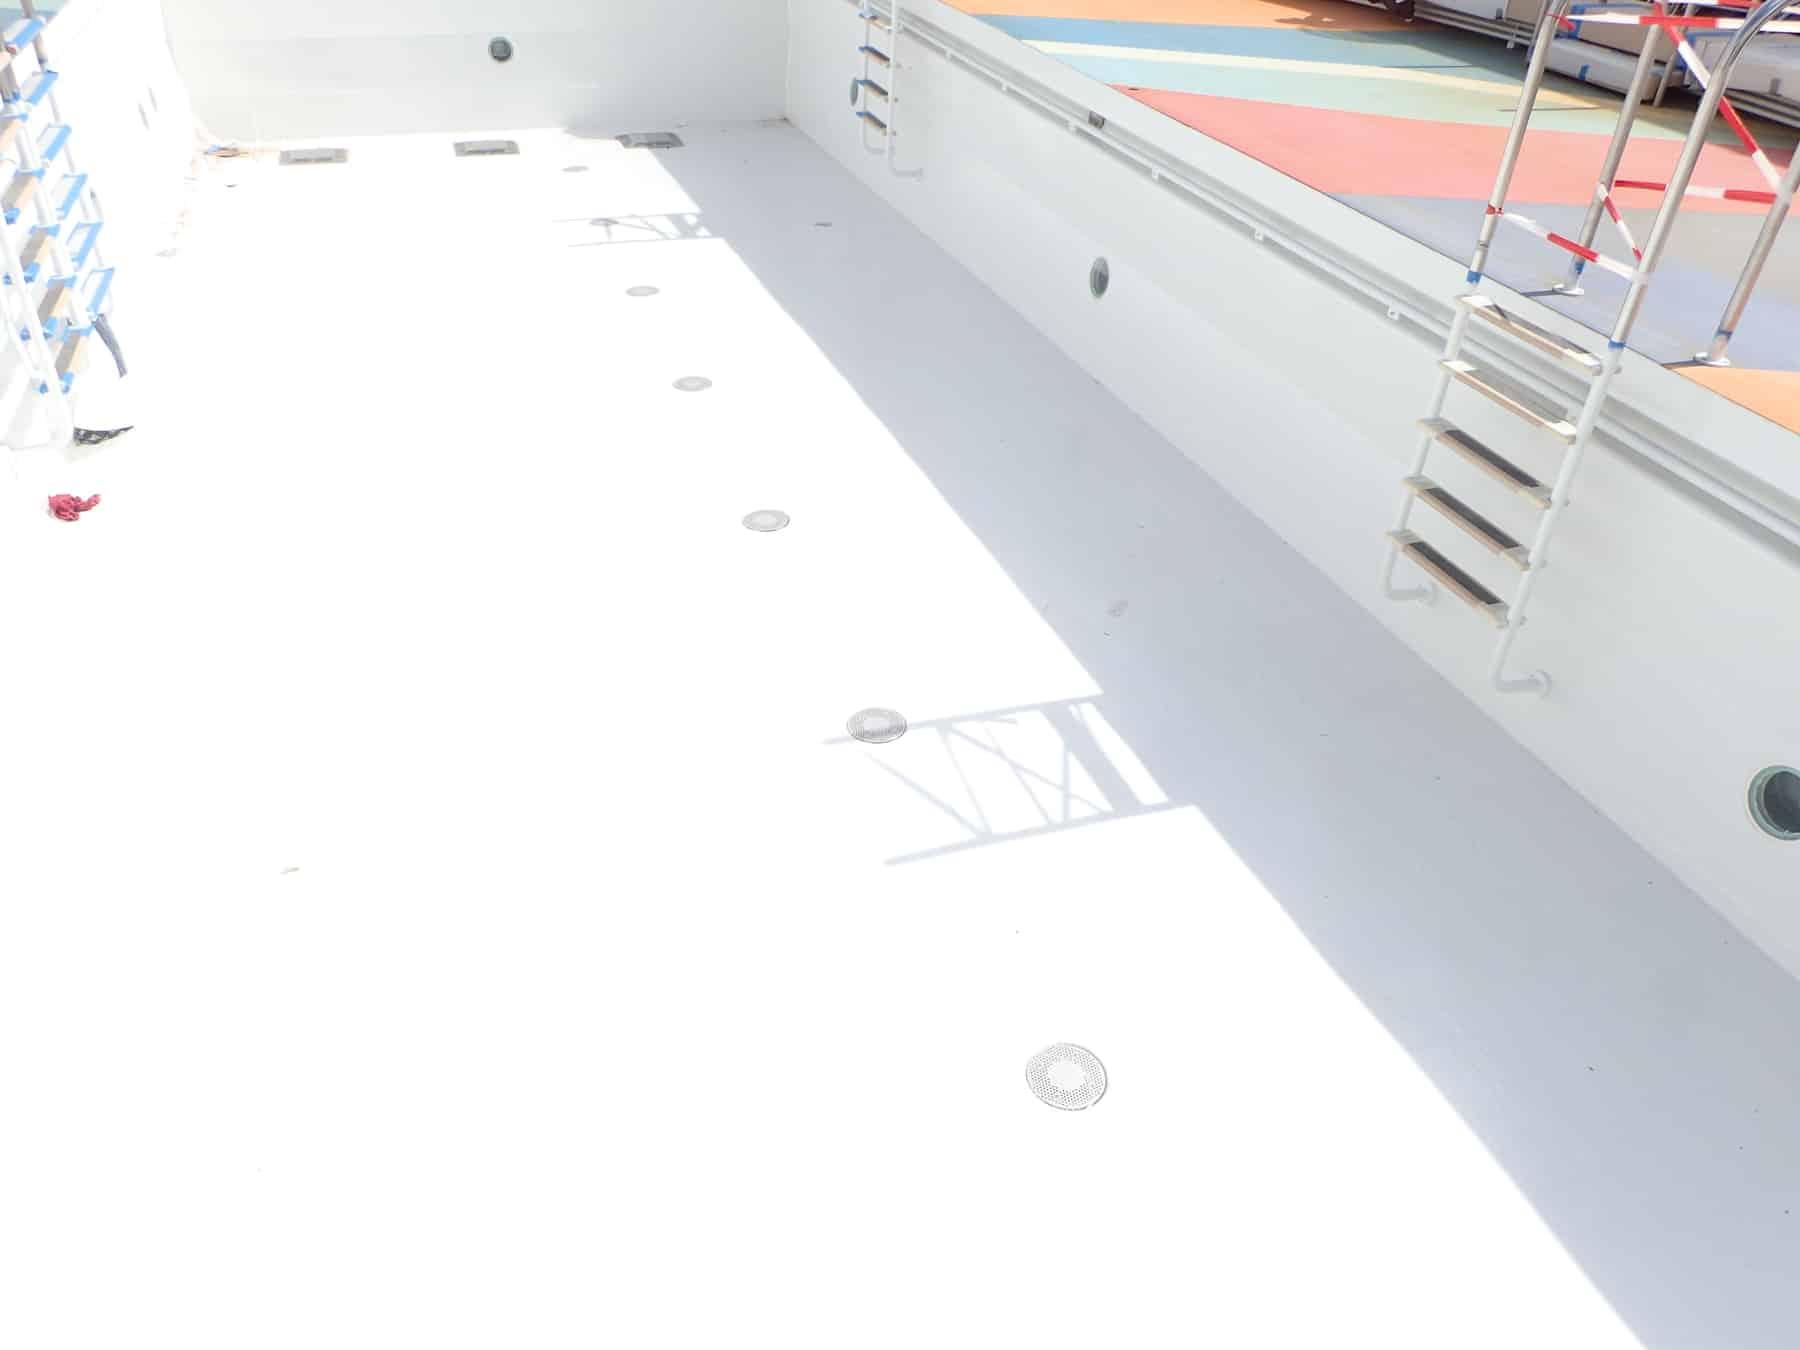 cruise ship swimming pool painted white